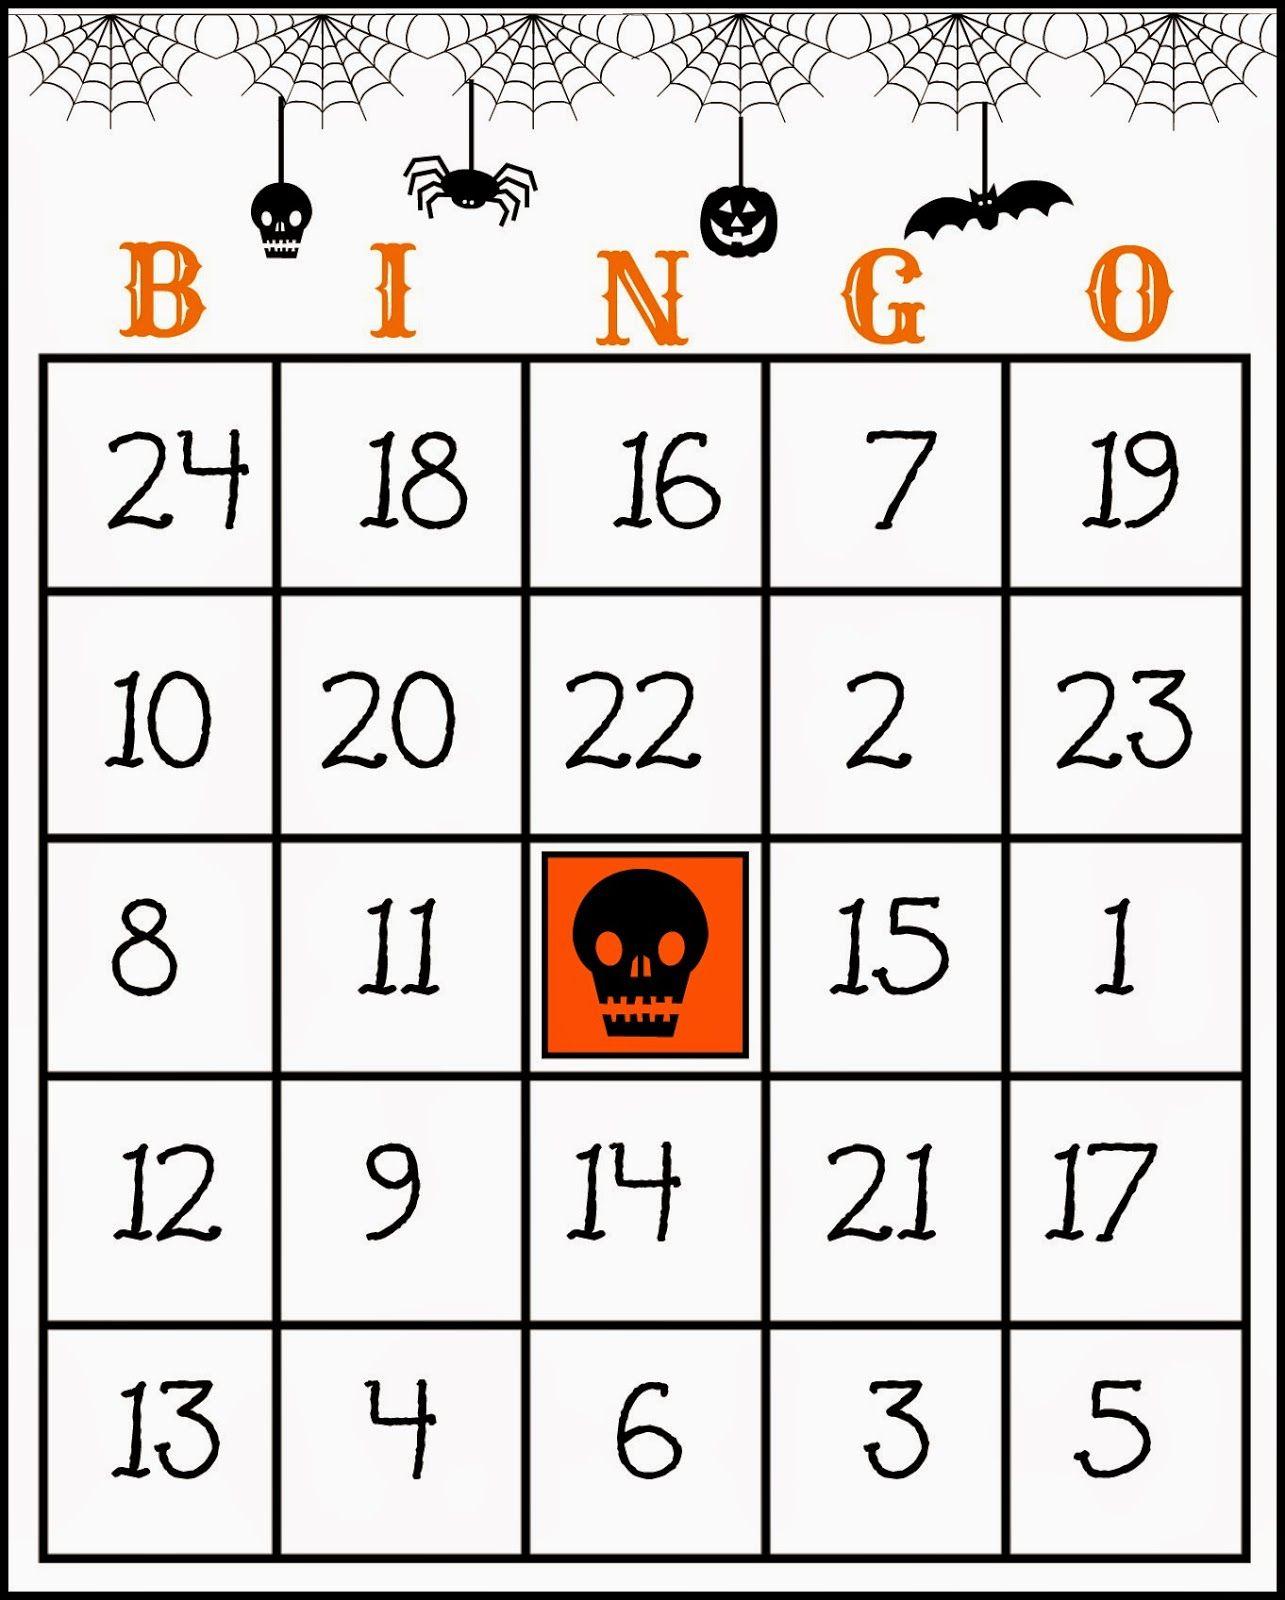 Crafty In Crosby: Free Printable Halloween Bingo Game   Products I - Free Printable Halloween Bingo Cards